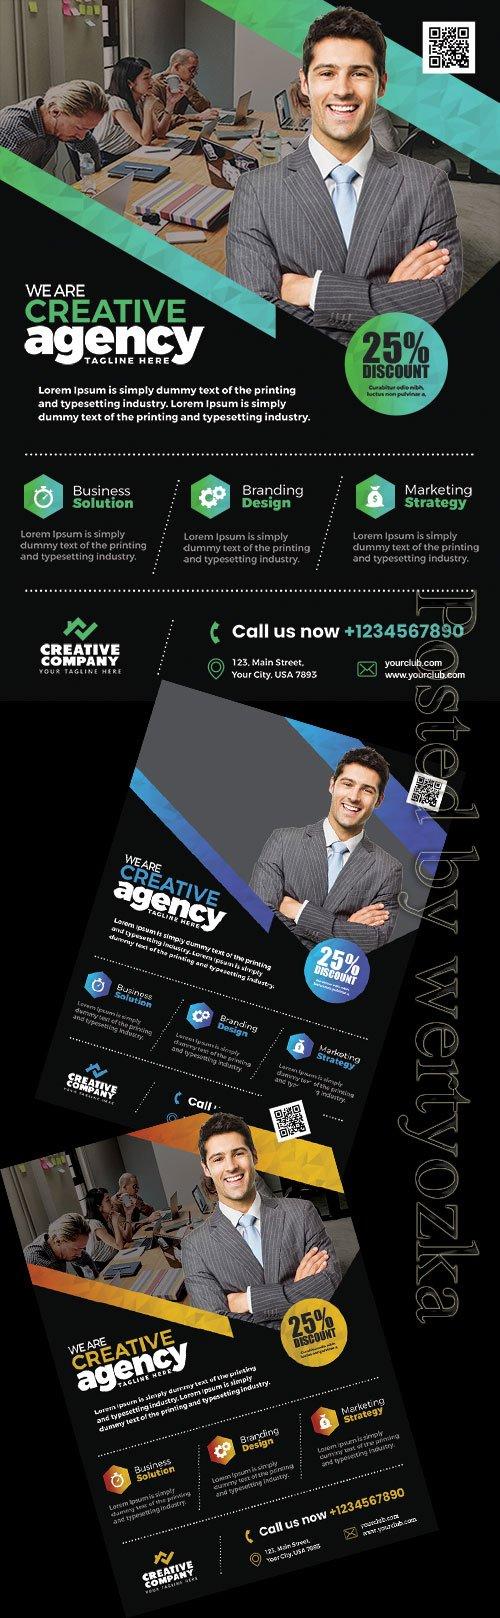 Business Promotion - Premium flyer psd template